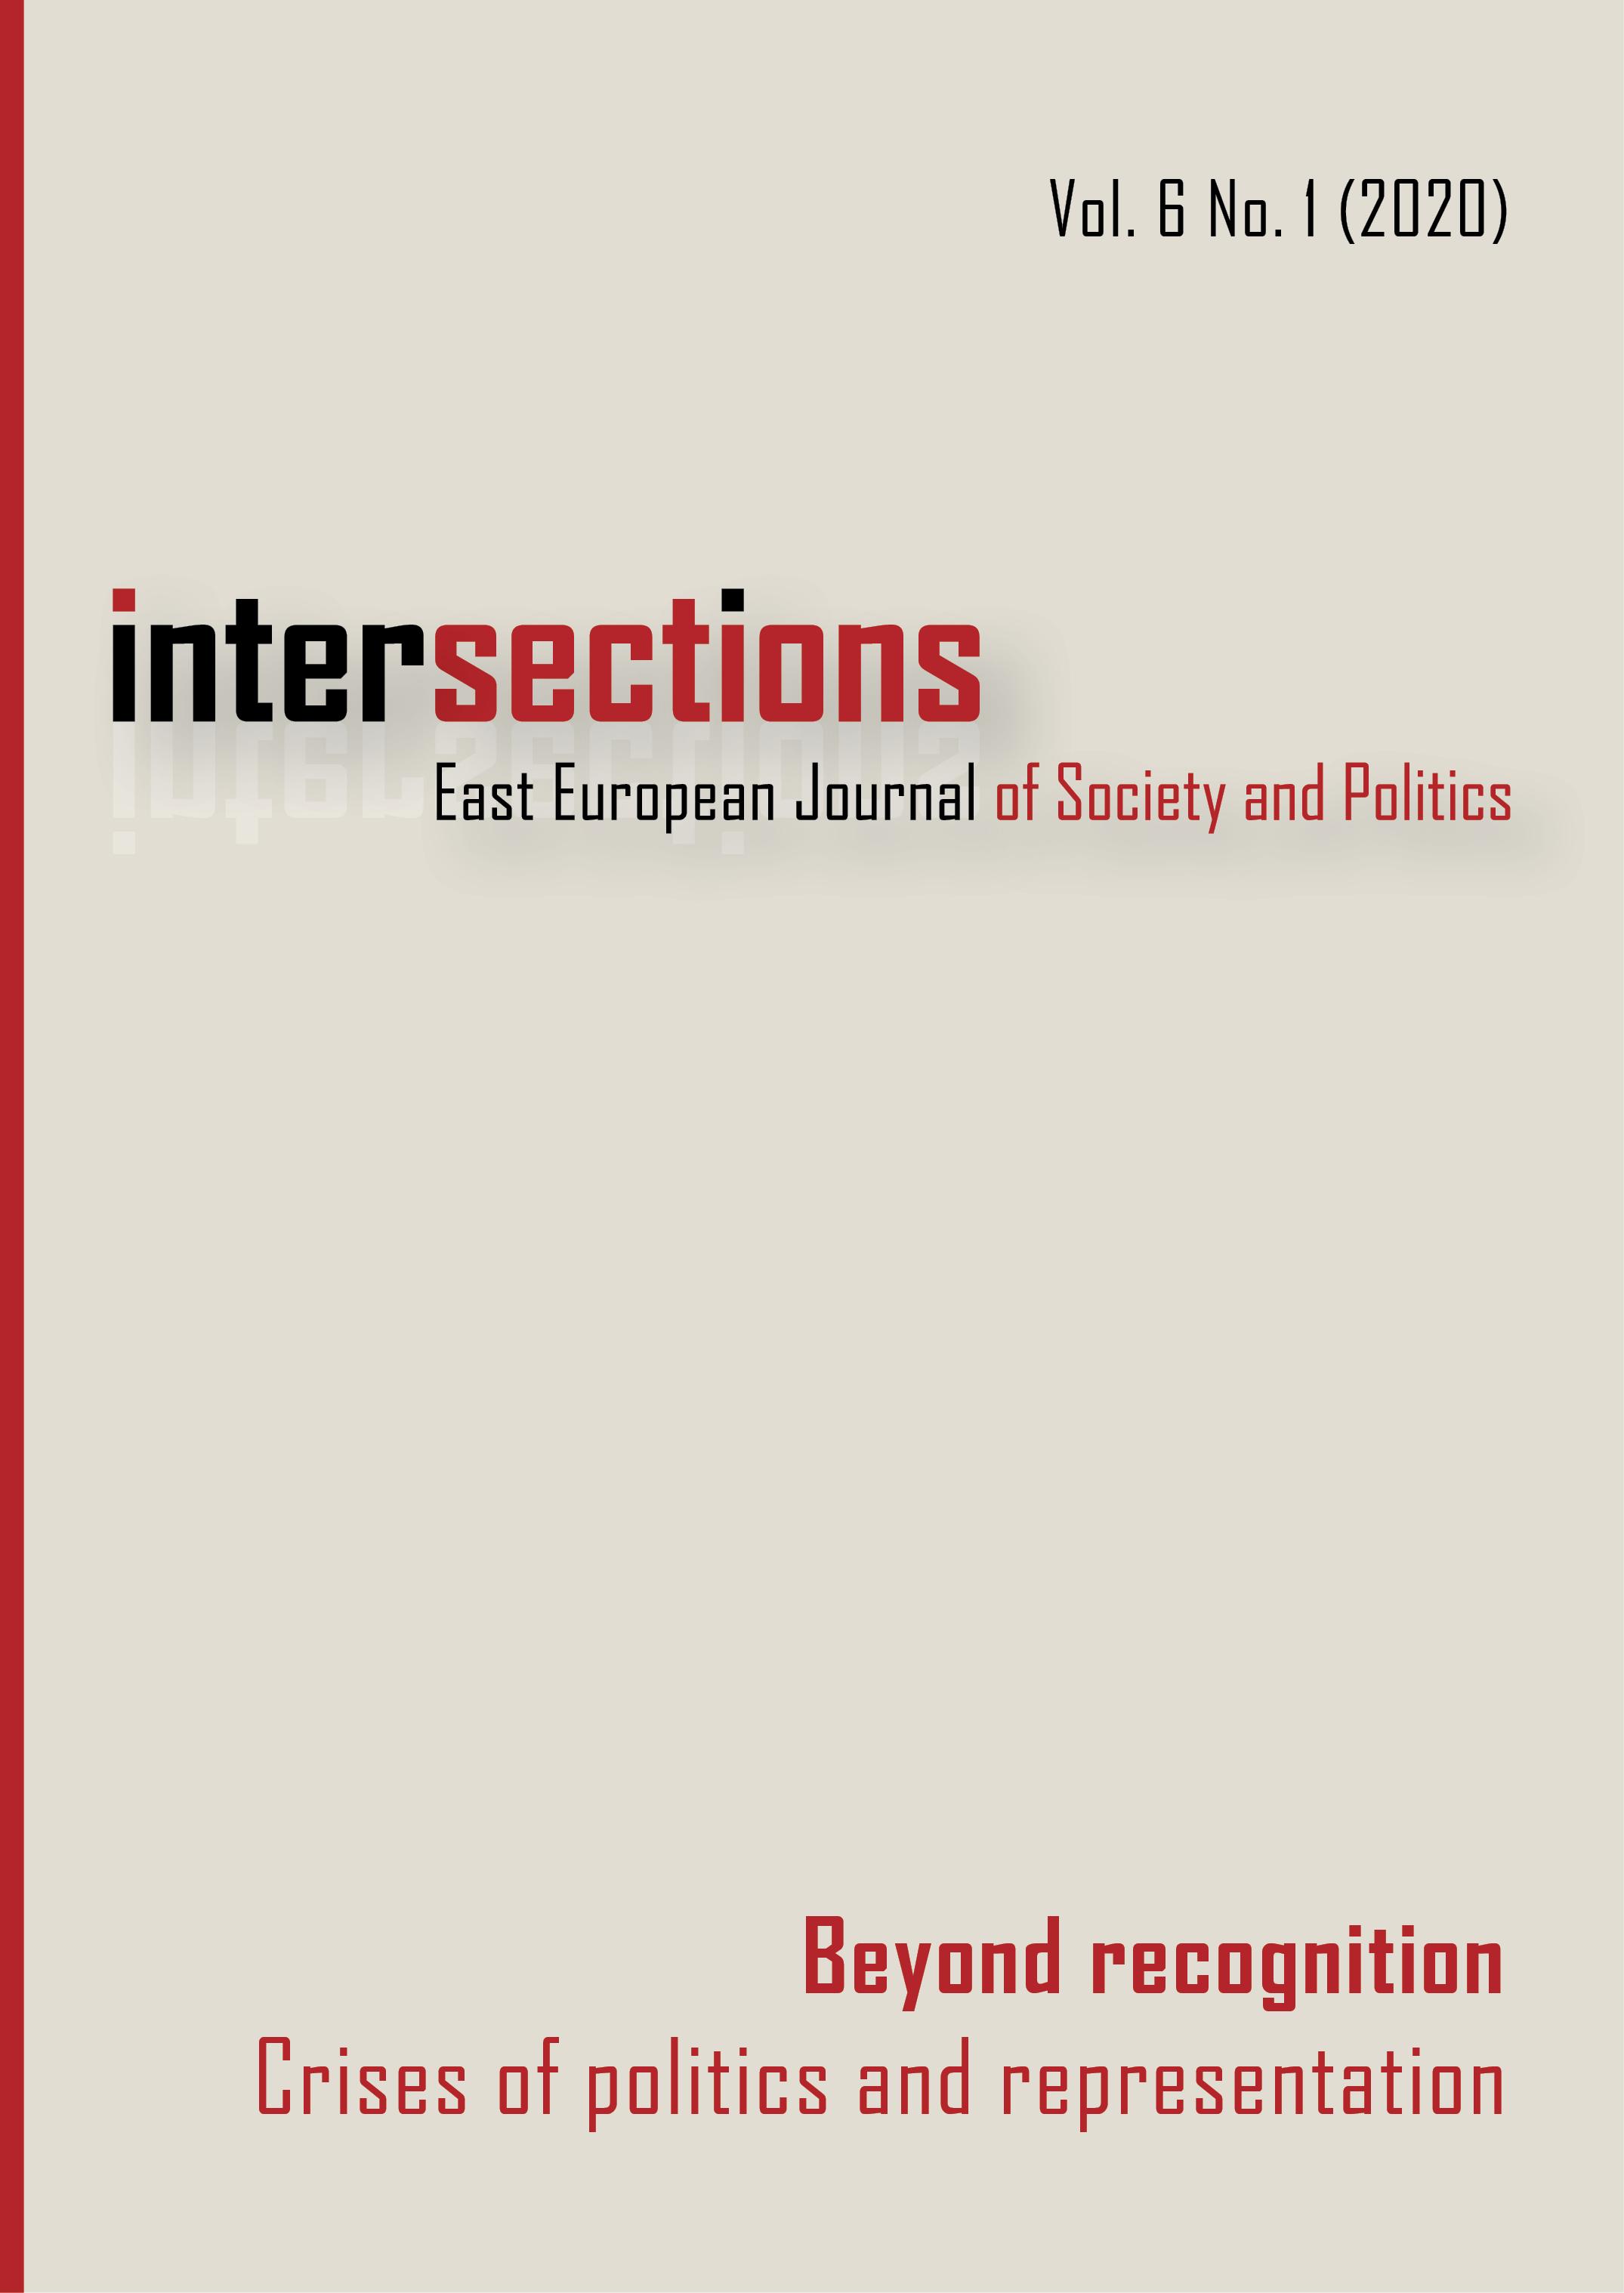 View Vol. 6 No. 1 (2020): Beyond Recognition: Crises of Politics and Representation